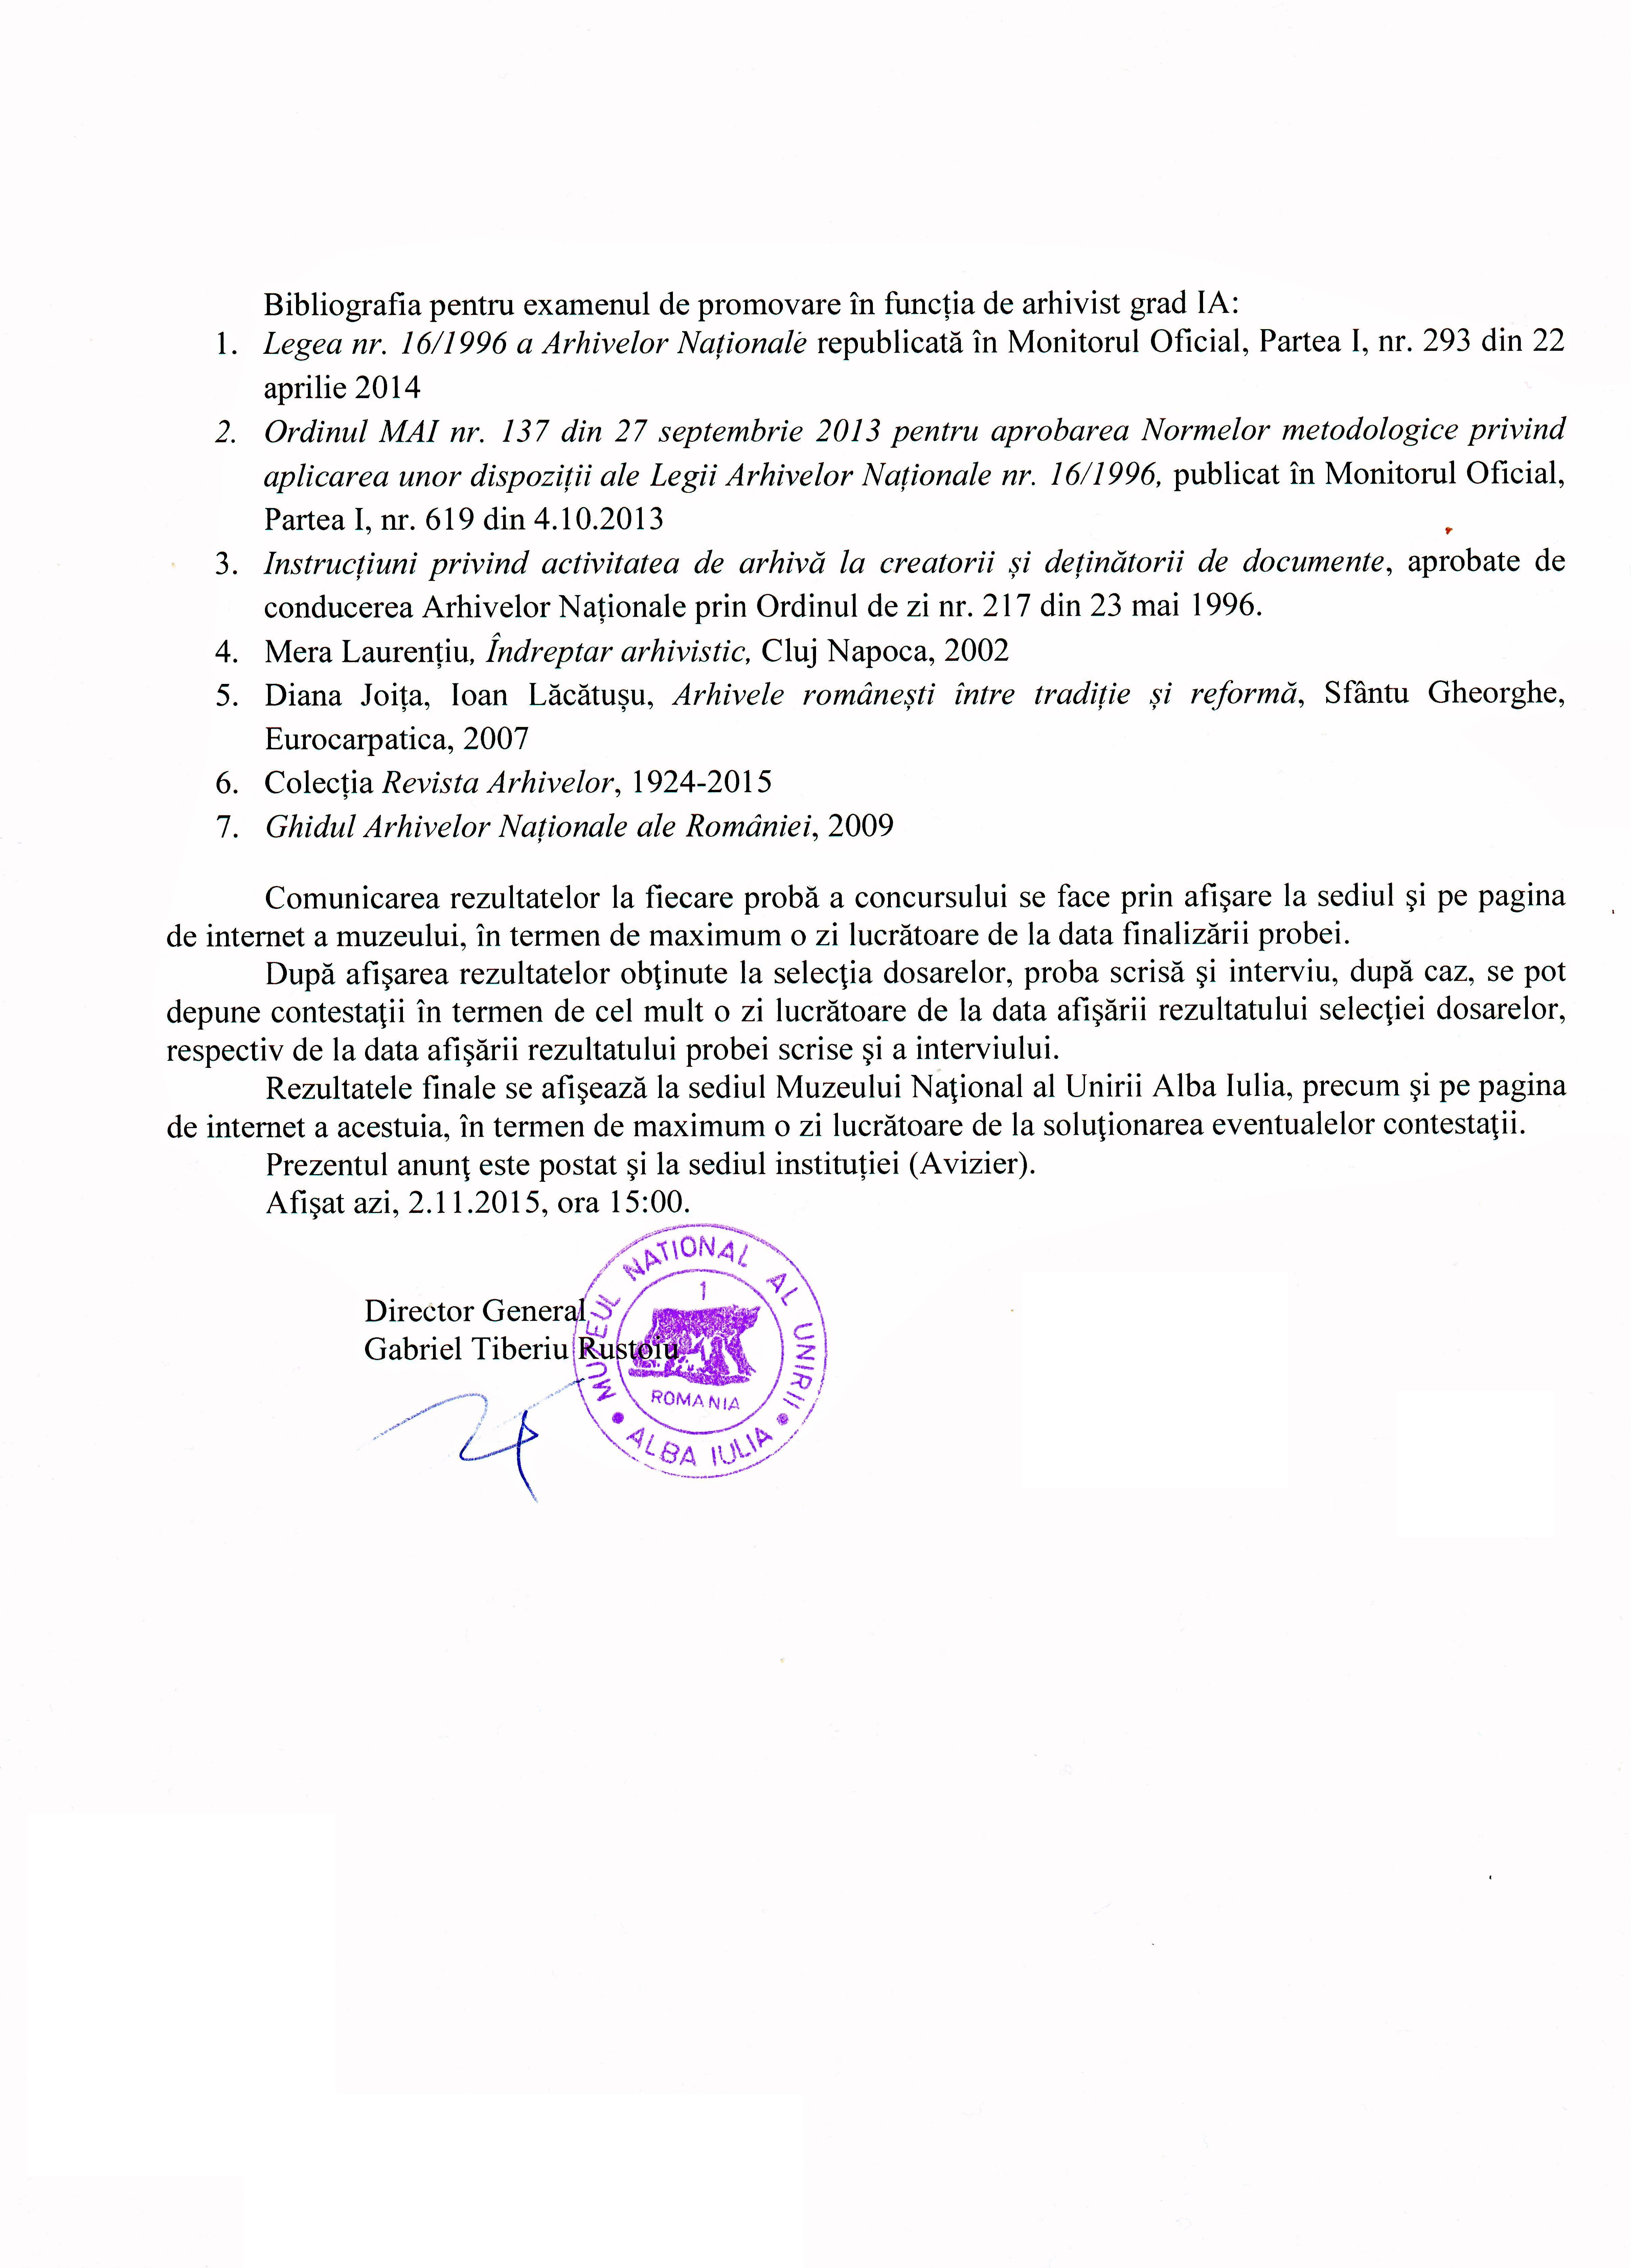 secretariat 2 noiembrie 2015 (2)